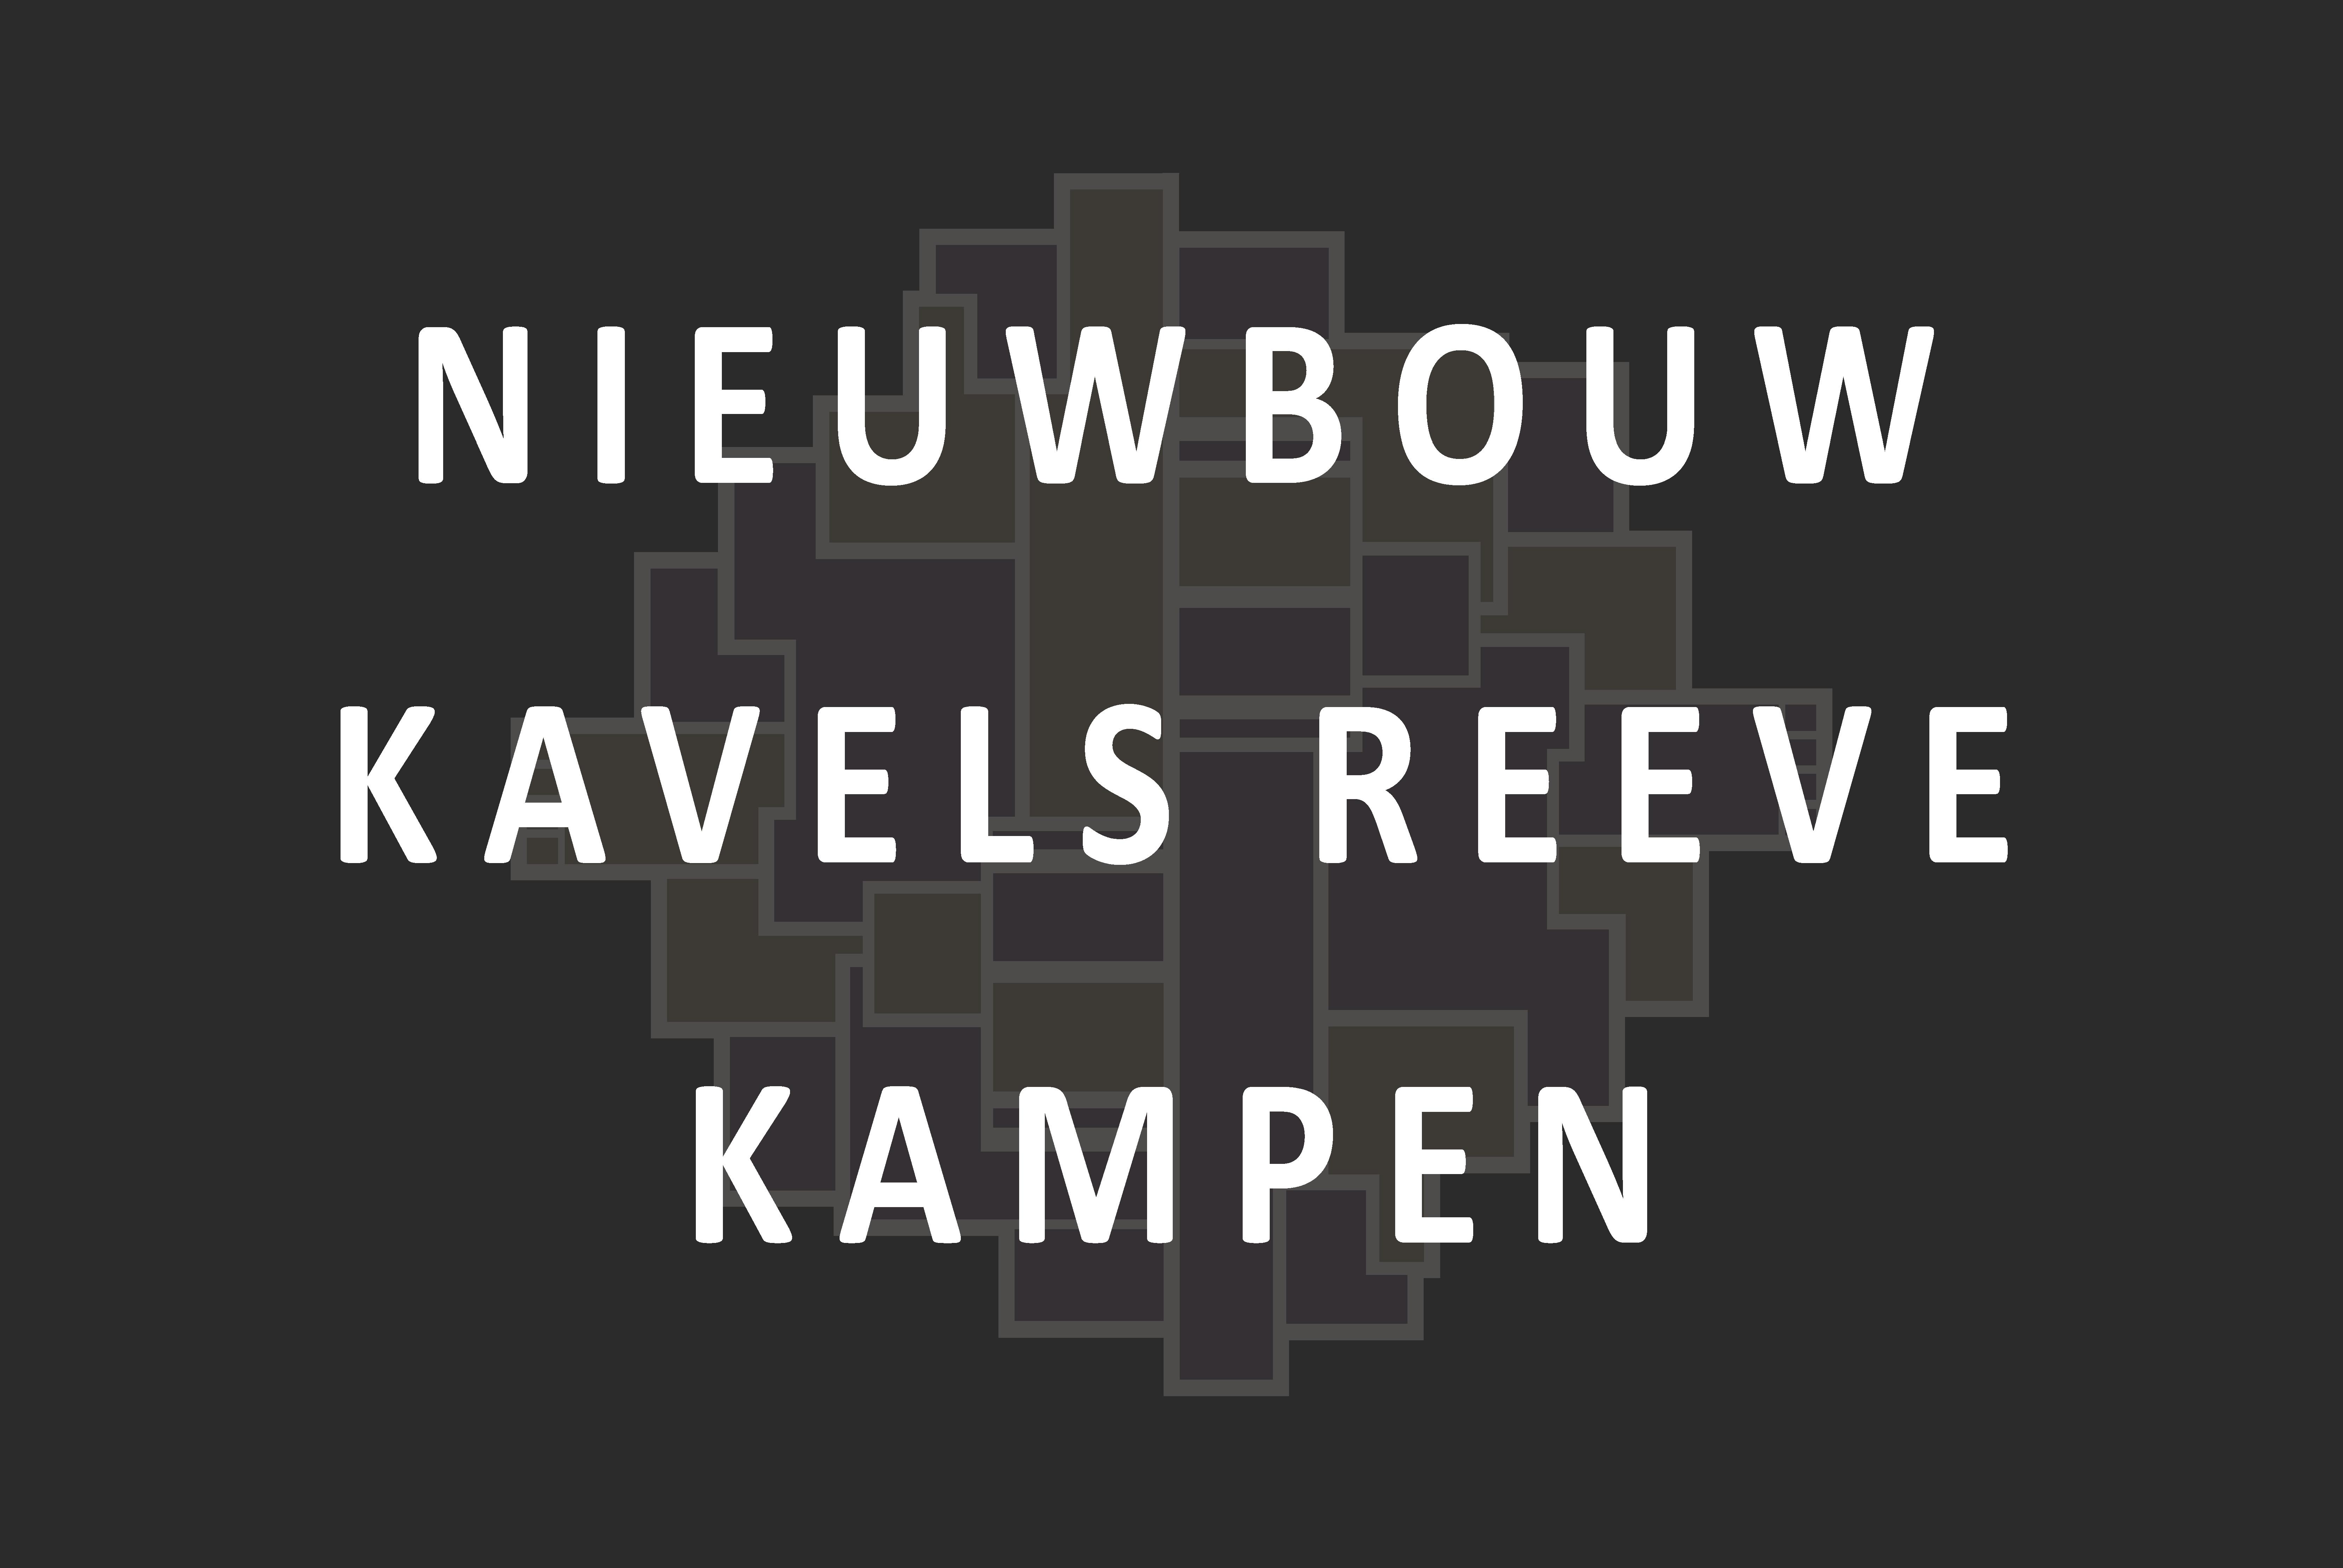 Kavels_nieuwbouwkavels Reeve